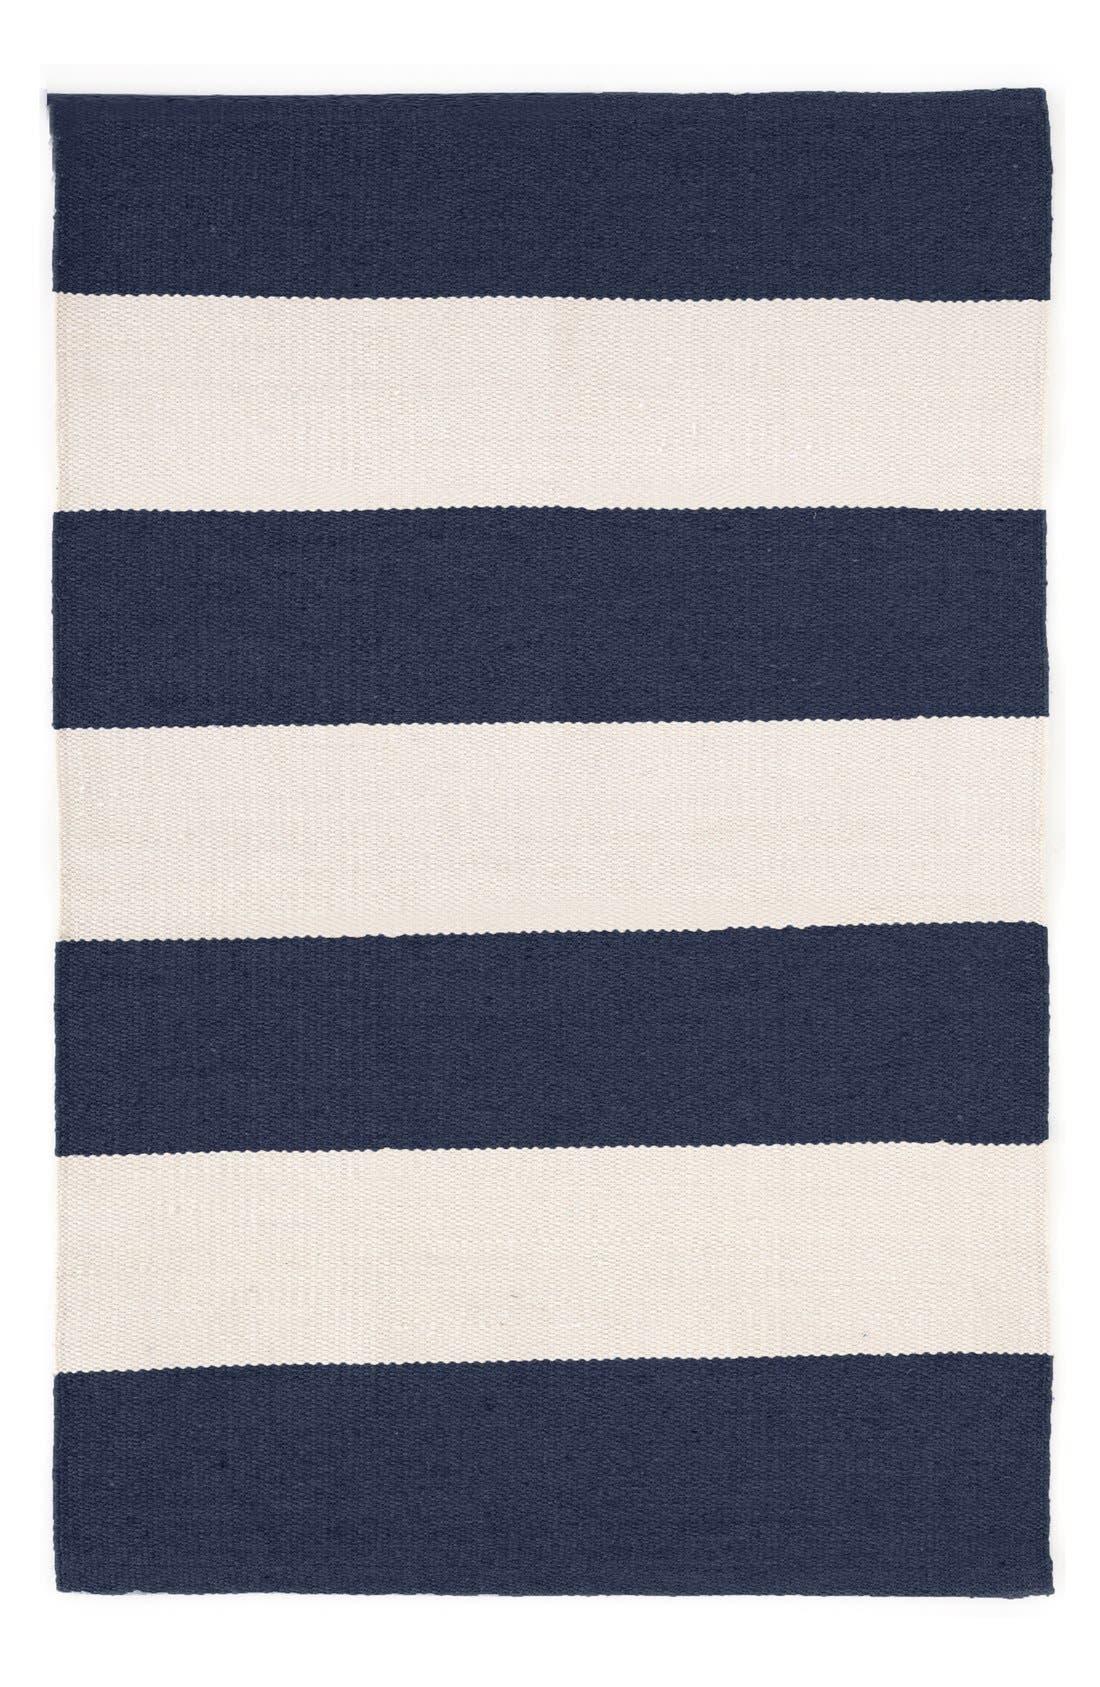 'Falls Village Stripe' Rug,                         Main,                         color, Navy